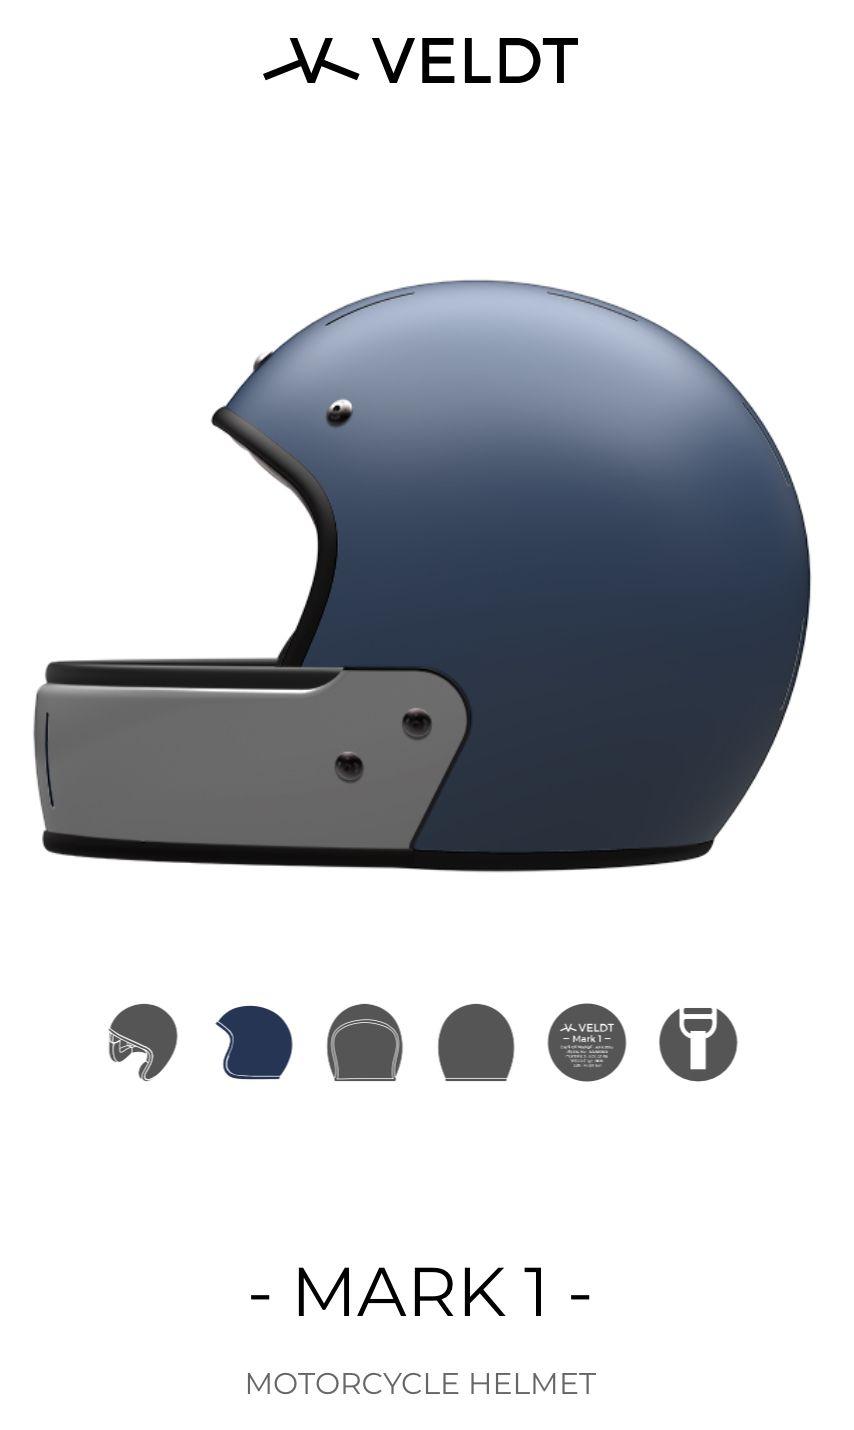 Configurator Create Your Own Helmet Custom Motorcycle Helmets